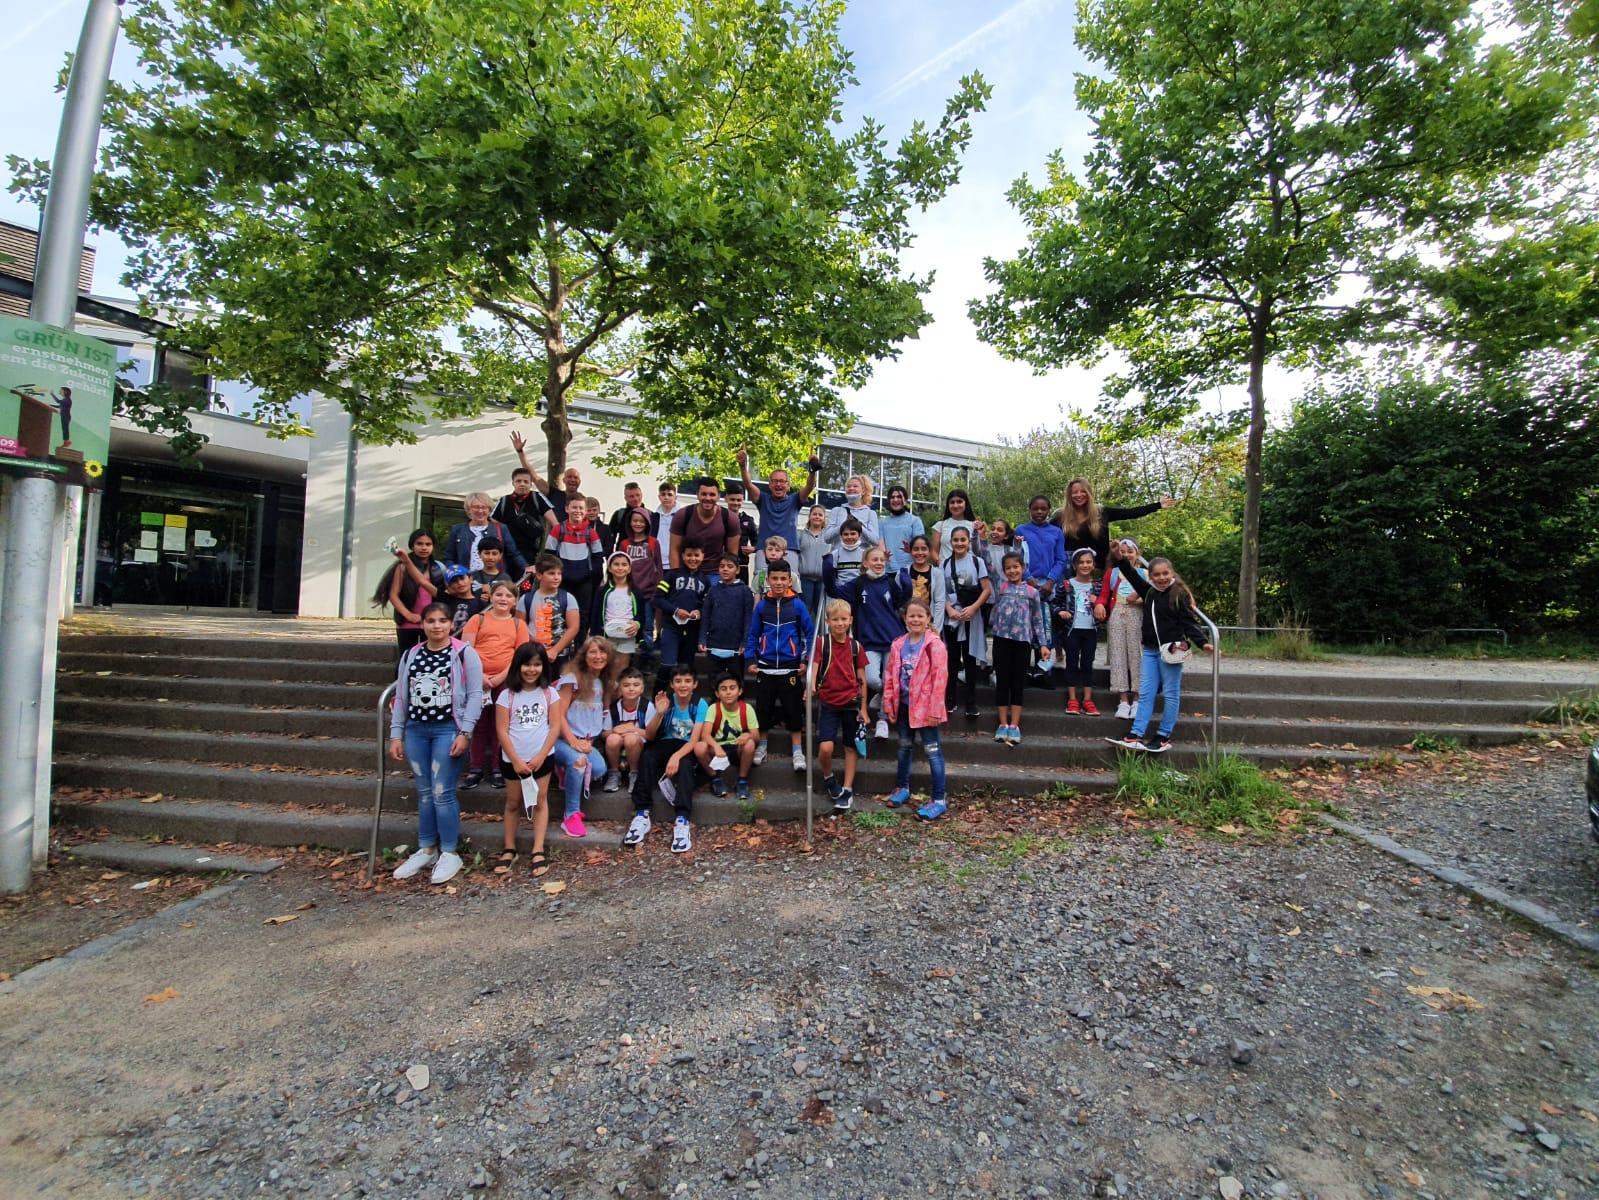 Kinderferientag 2020 – Ein Tag mit 40 Kindern im Phantasialand!